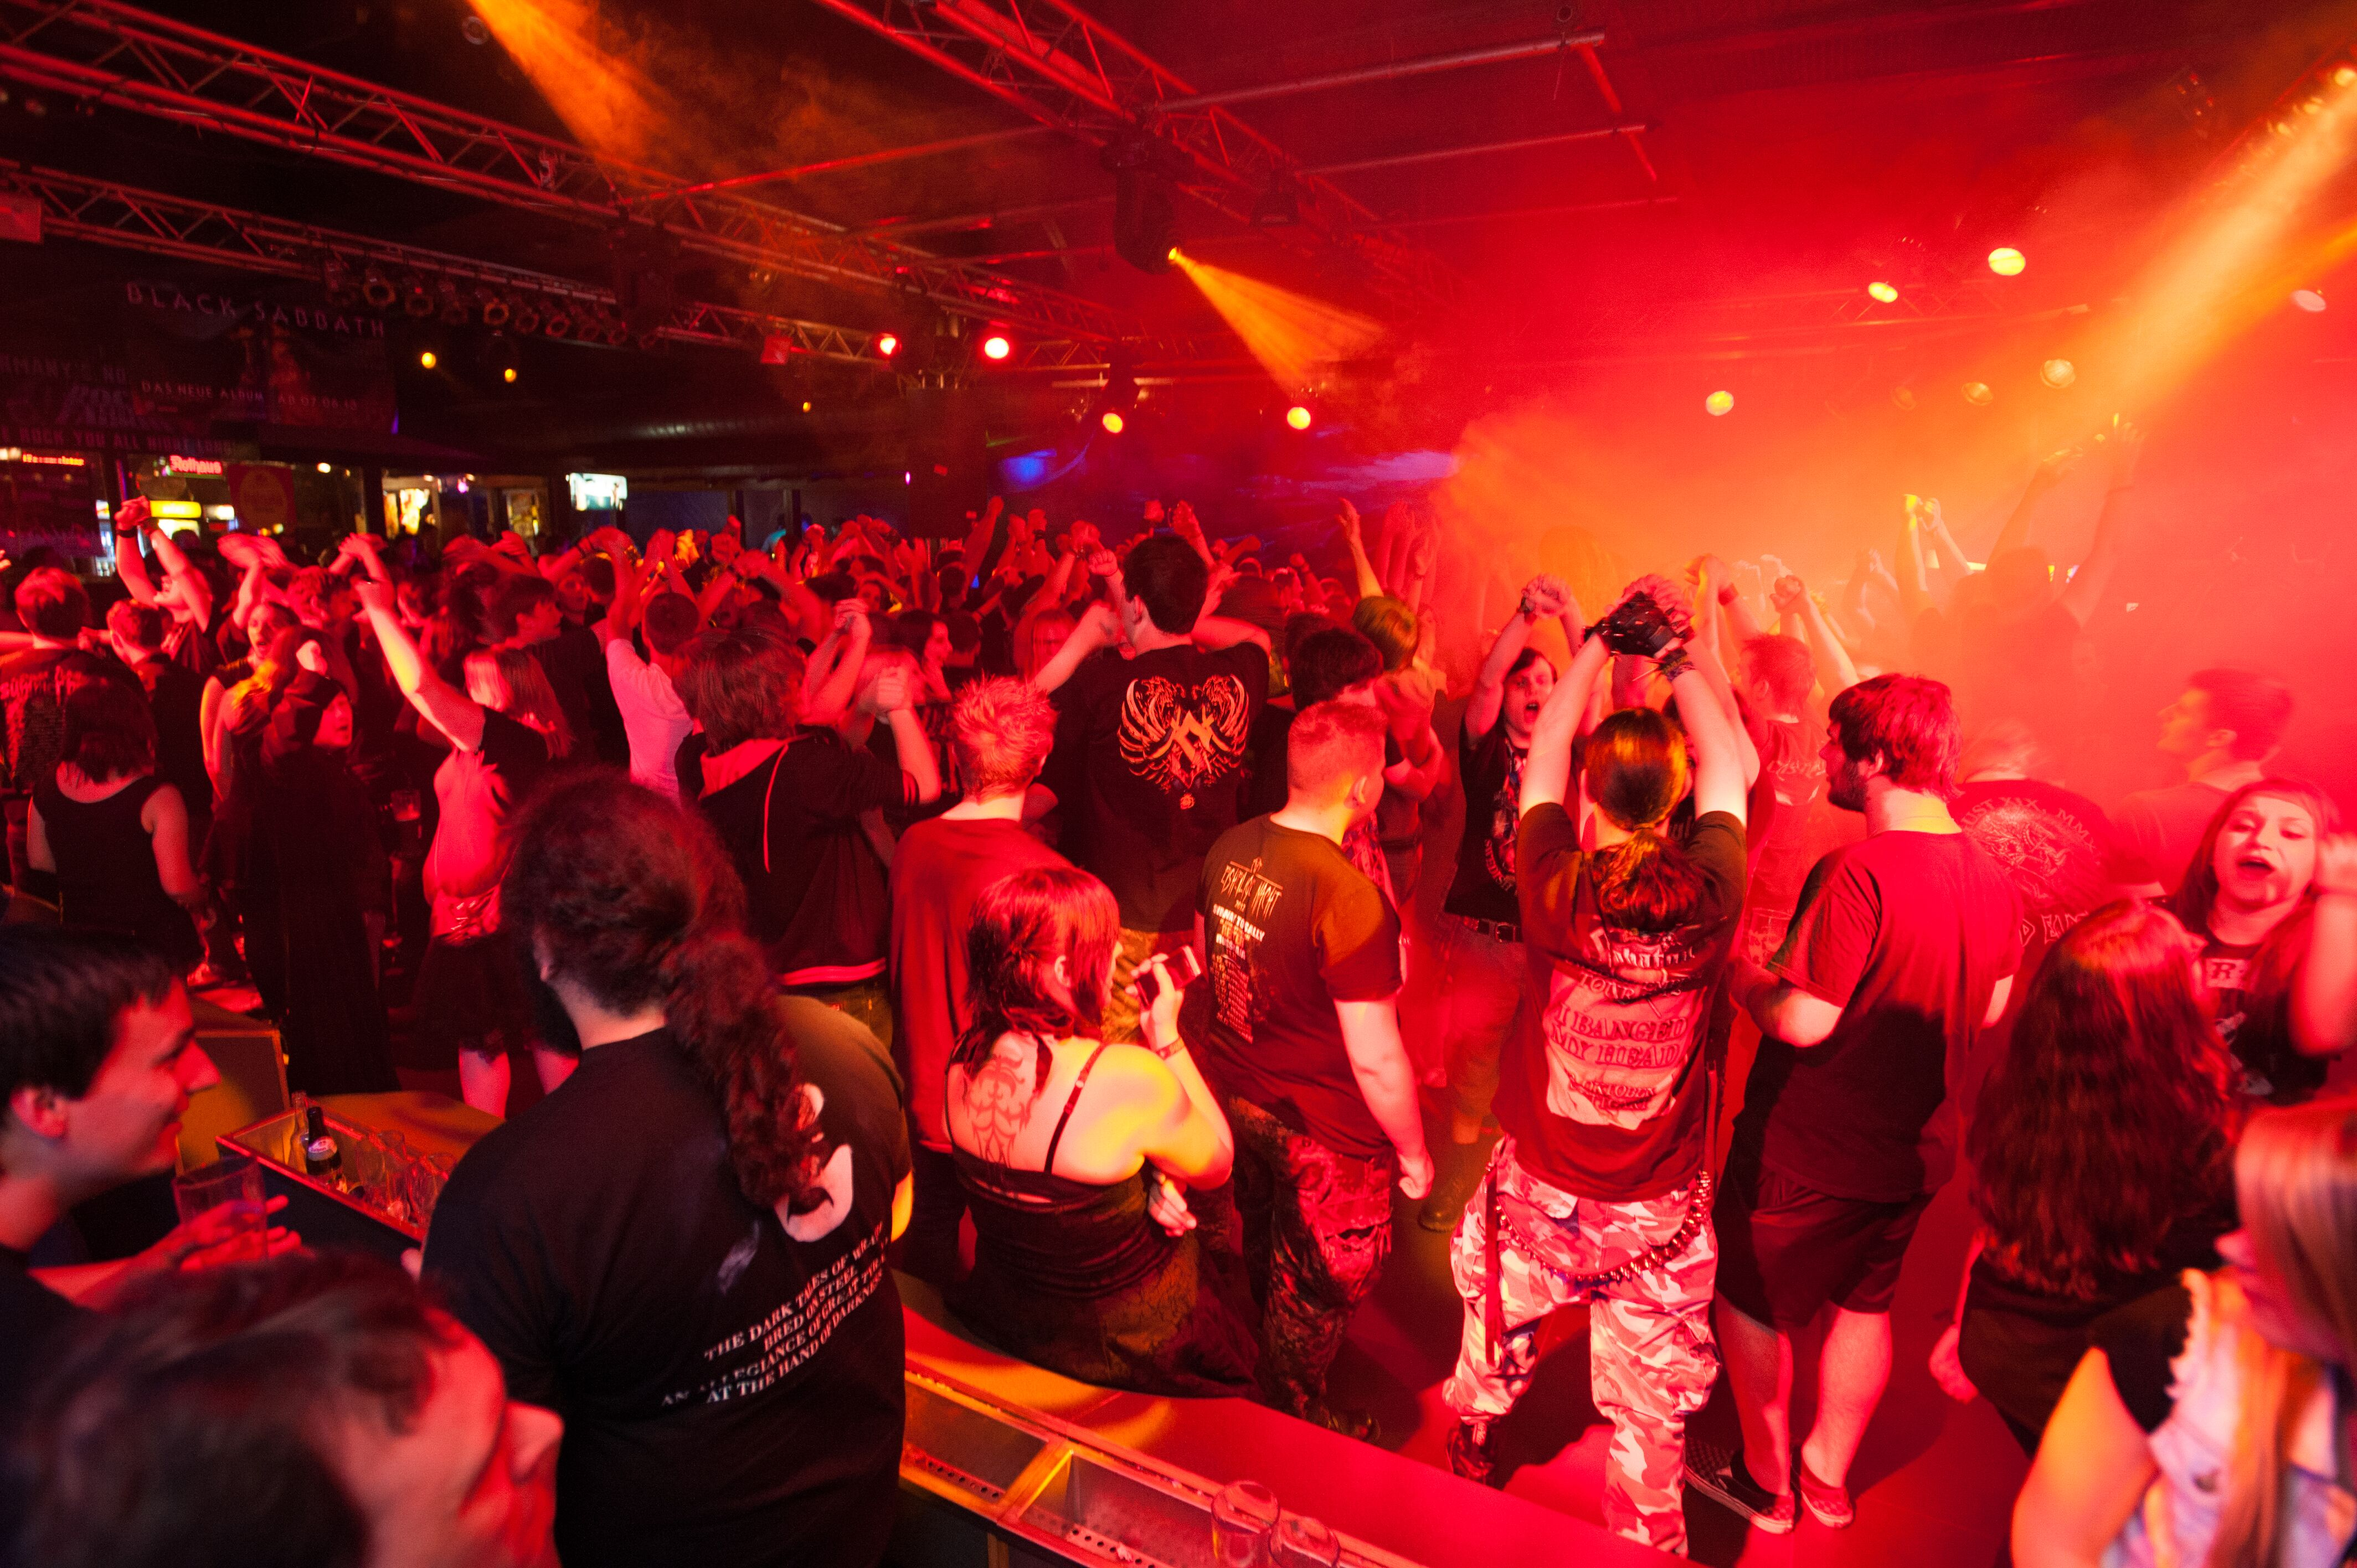 http://www.rockfabrik-ludwigsburg.de/wp-content/uploads/2016/12/NlchP2Y9AFViftzYmViq2cOyDbD0J09jf4tSENxJL0s07xfdNTEHaBKBjtRC74NFx8cCUTImUzoyTdgaExE1HAUz1T8XG5JDRO7RosYmbBhgjP9dvrx9X-qZzVMHOEGsI.jpg